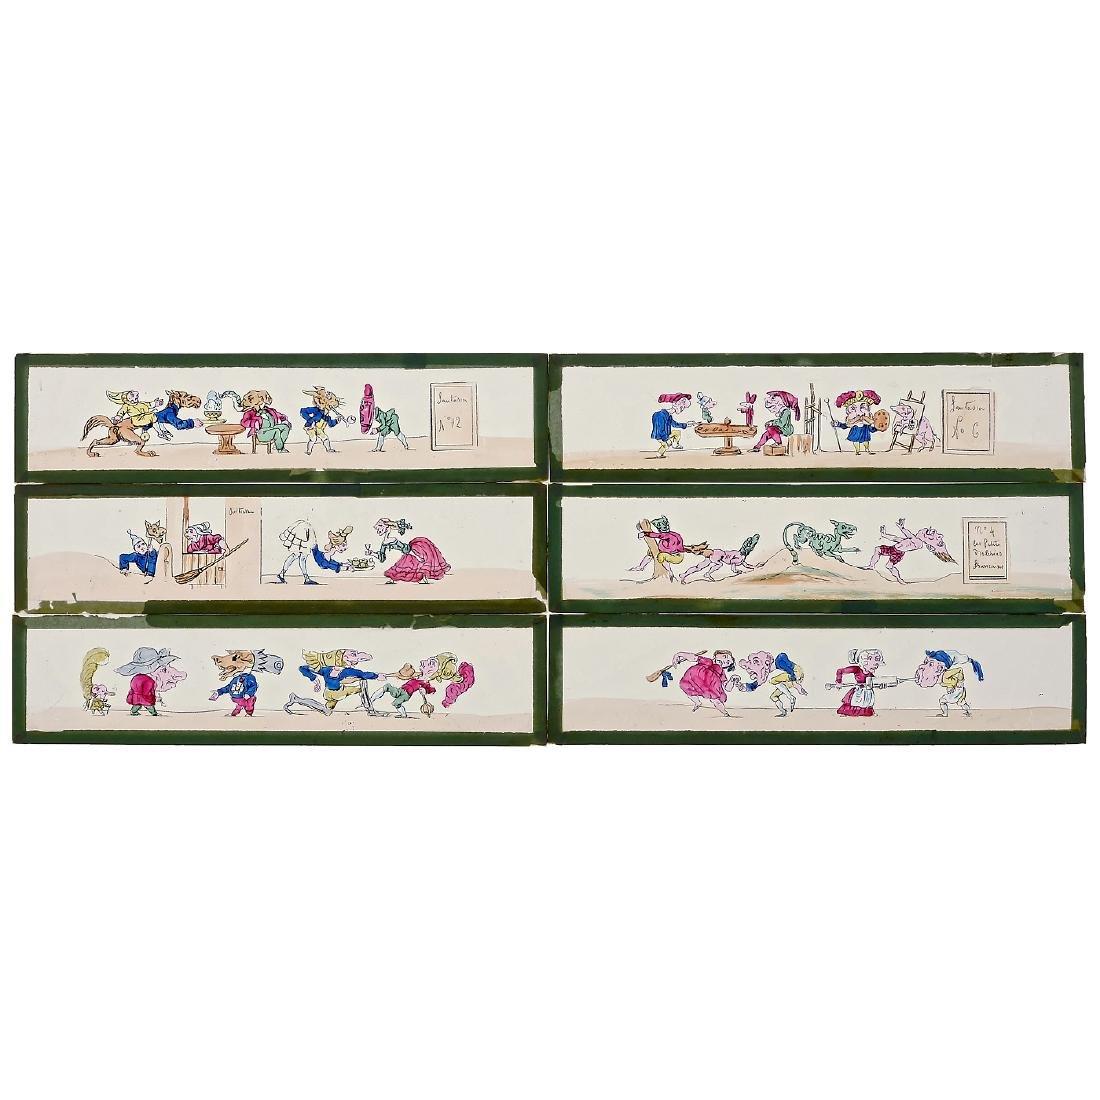 "6 ""Fantasia"" Lantern Slides of 5 x 21 cm by Lapierre,"